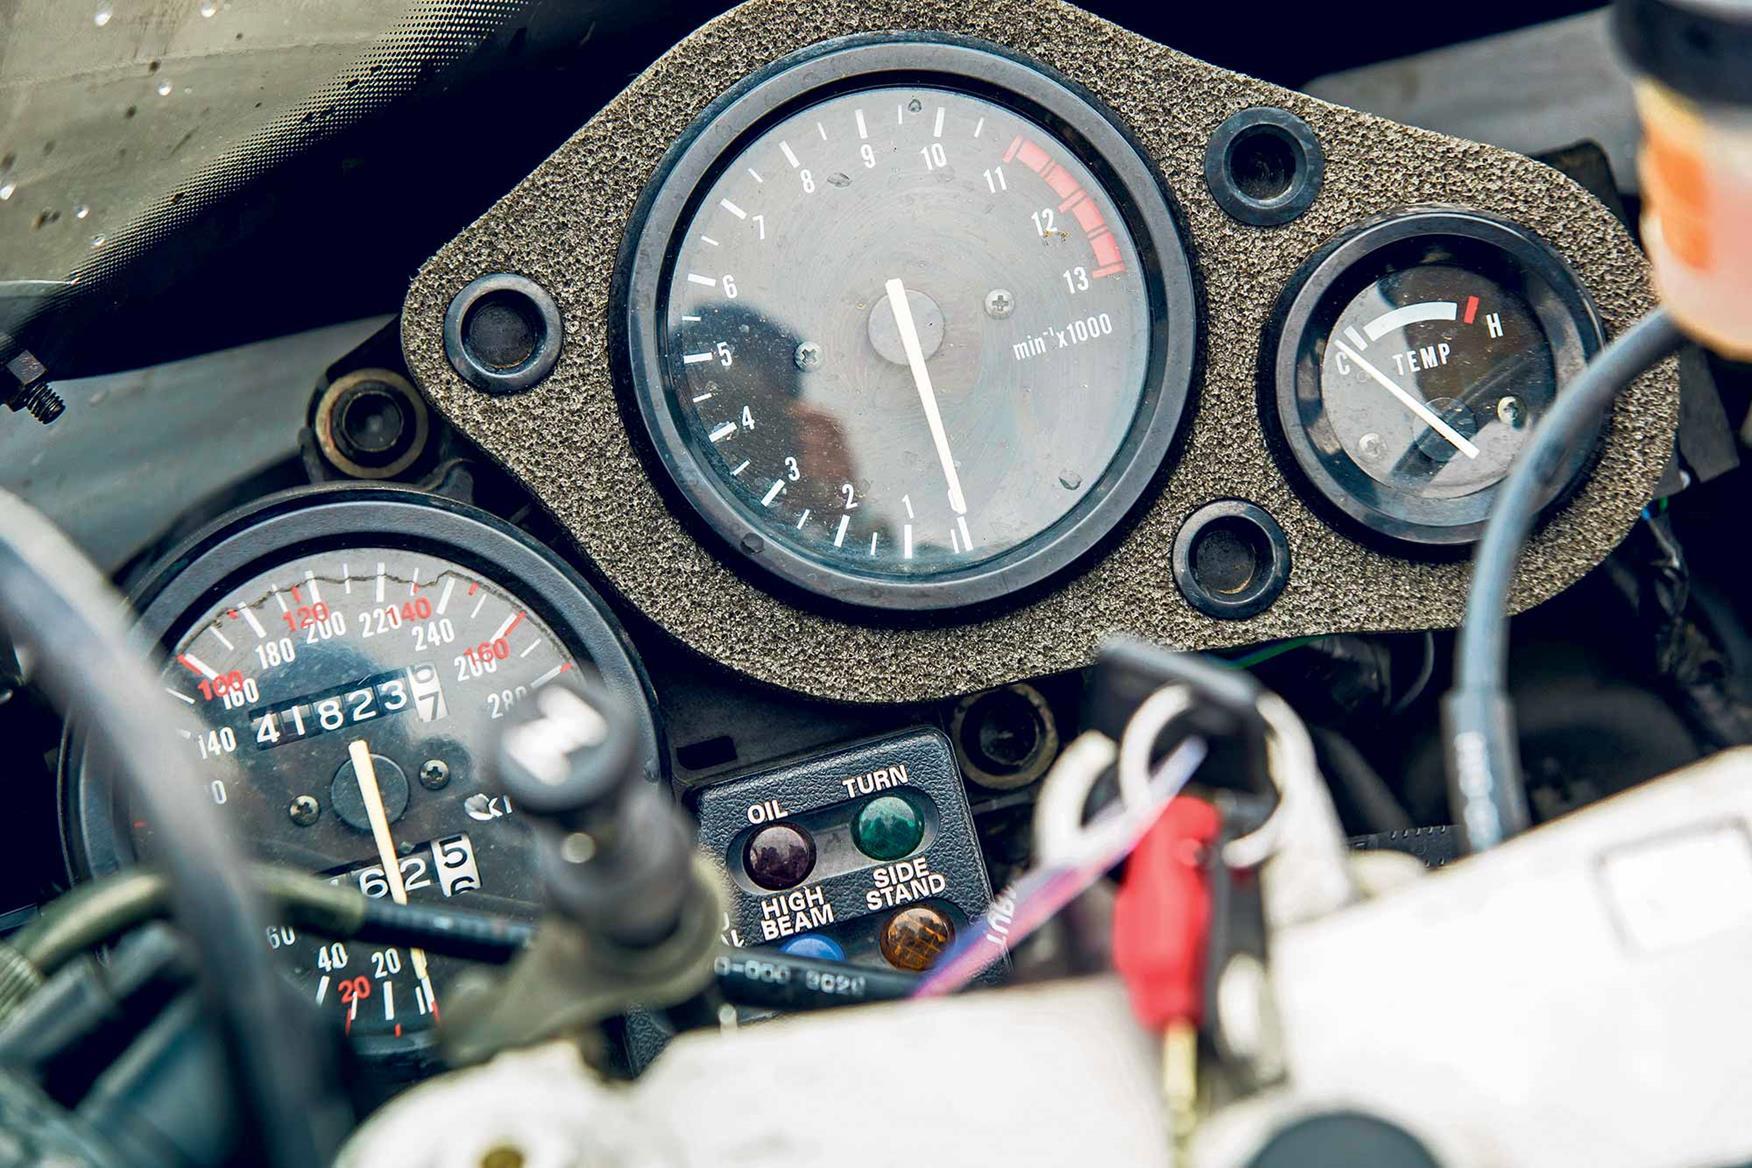 The clocks on the Honda CBR900RR FireBlade